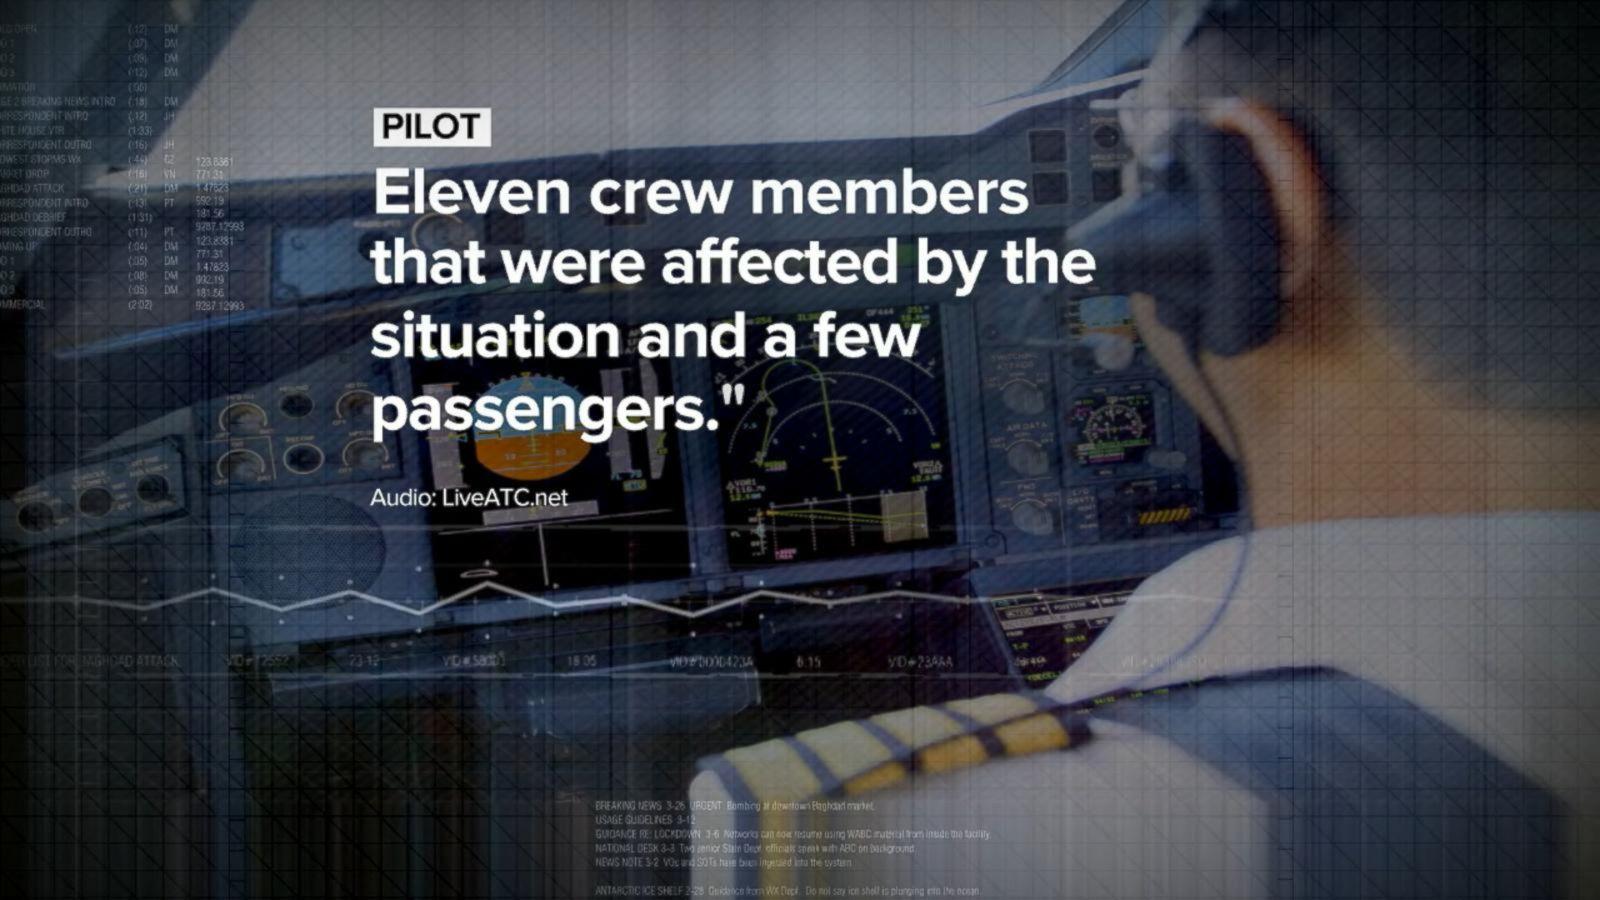 VIDEO: Sick Crew Forces Emergency Landing of British Airways Flight